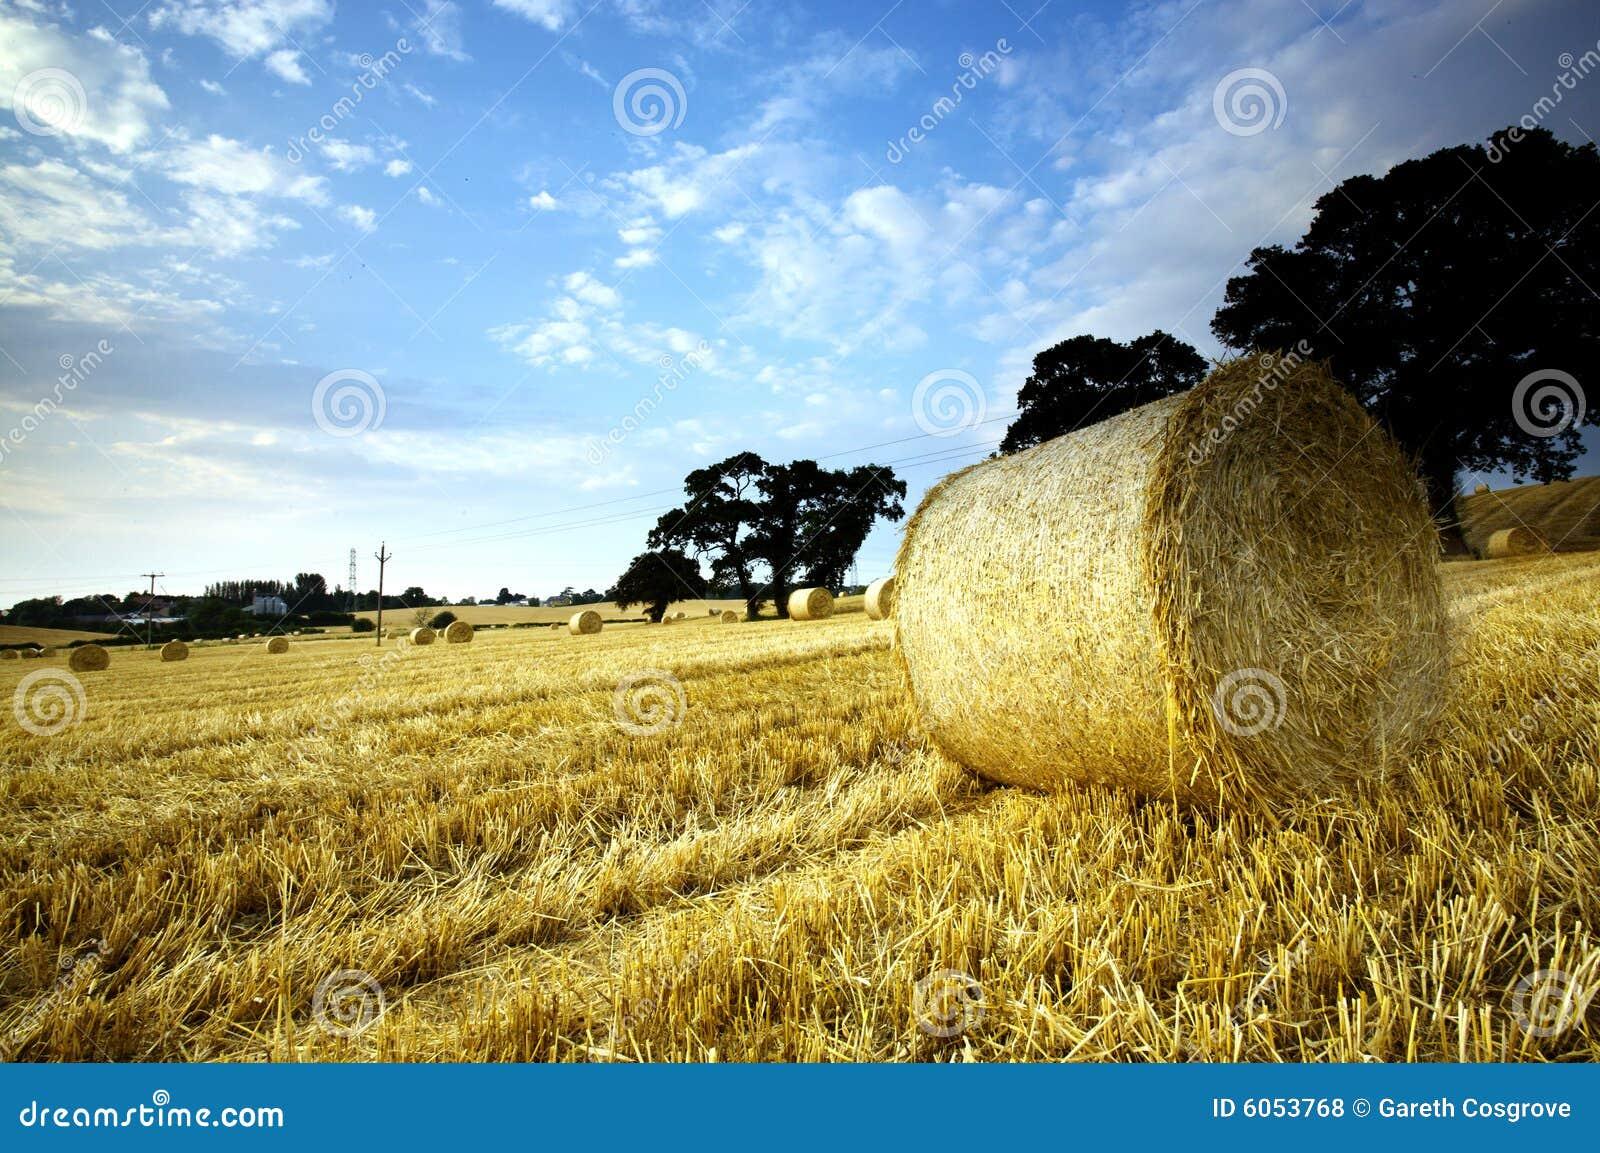 Hay bales in rural landscape